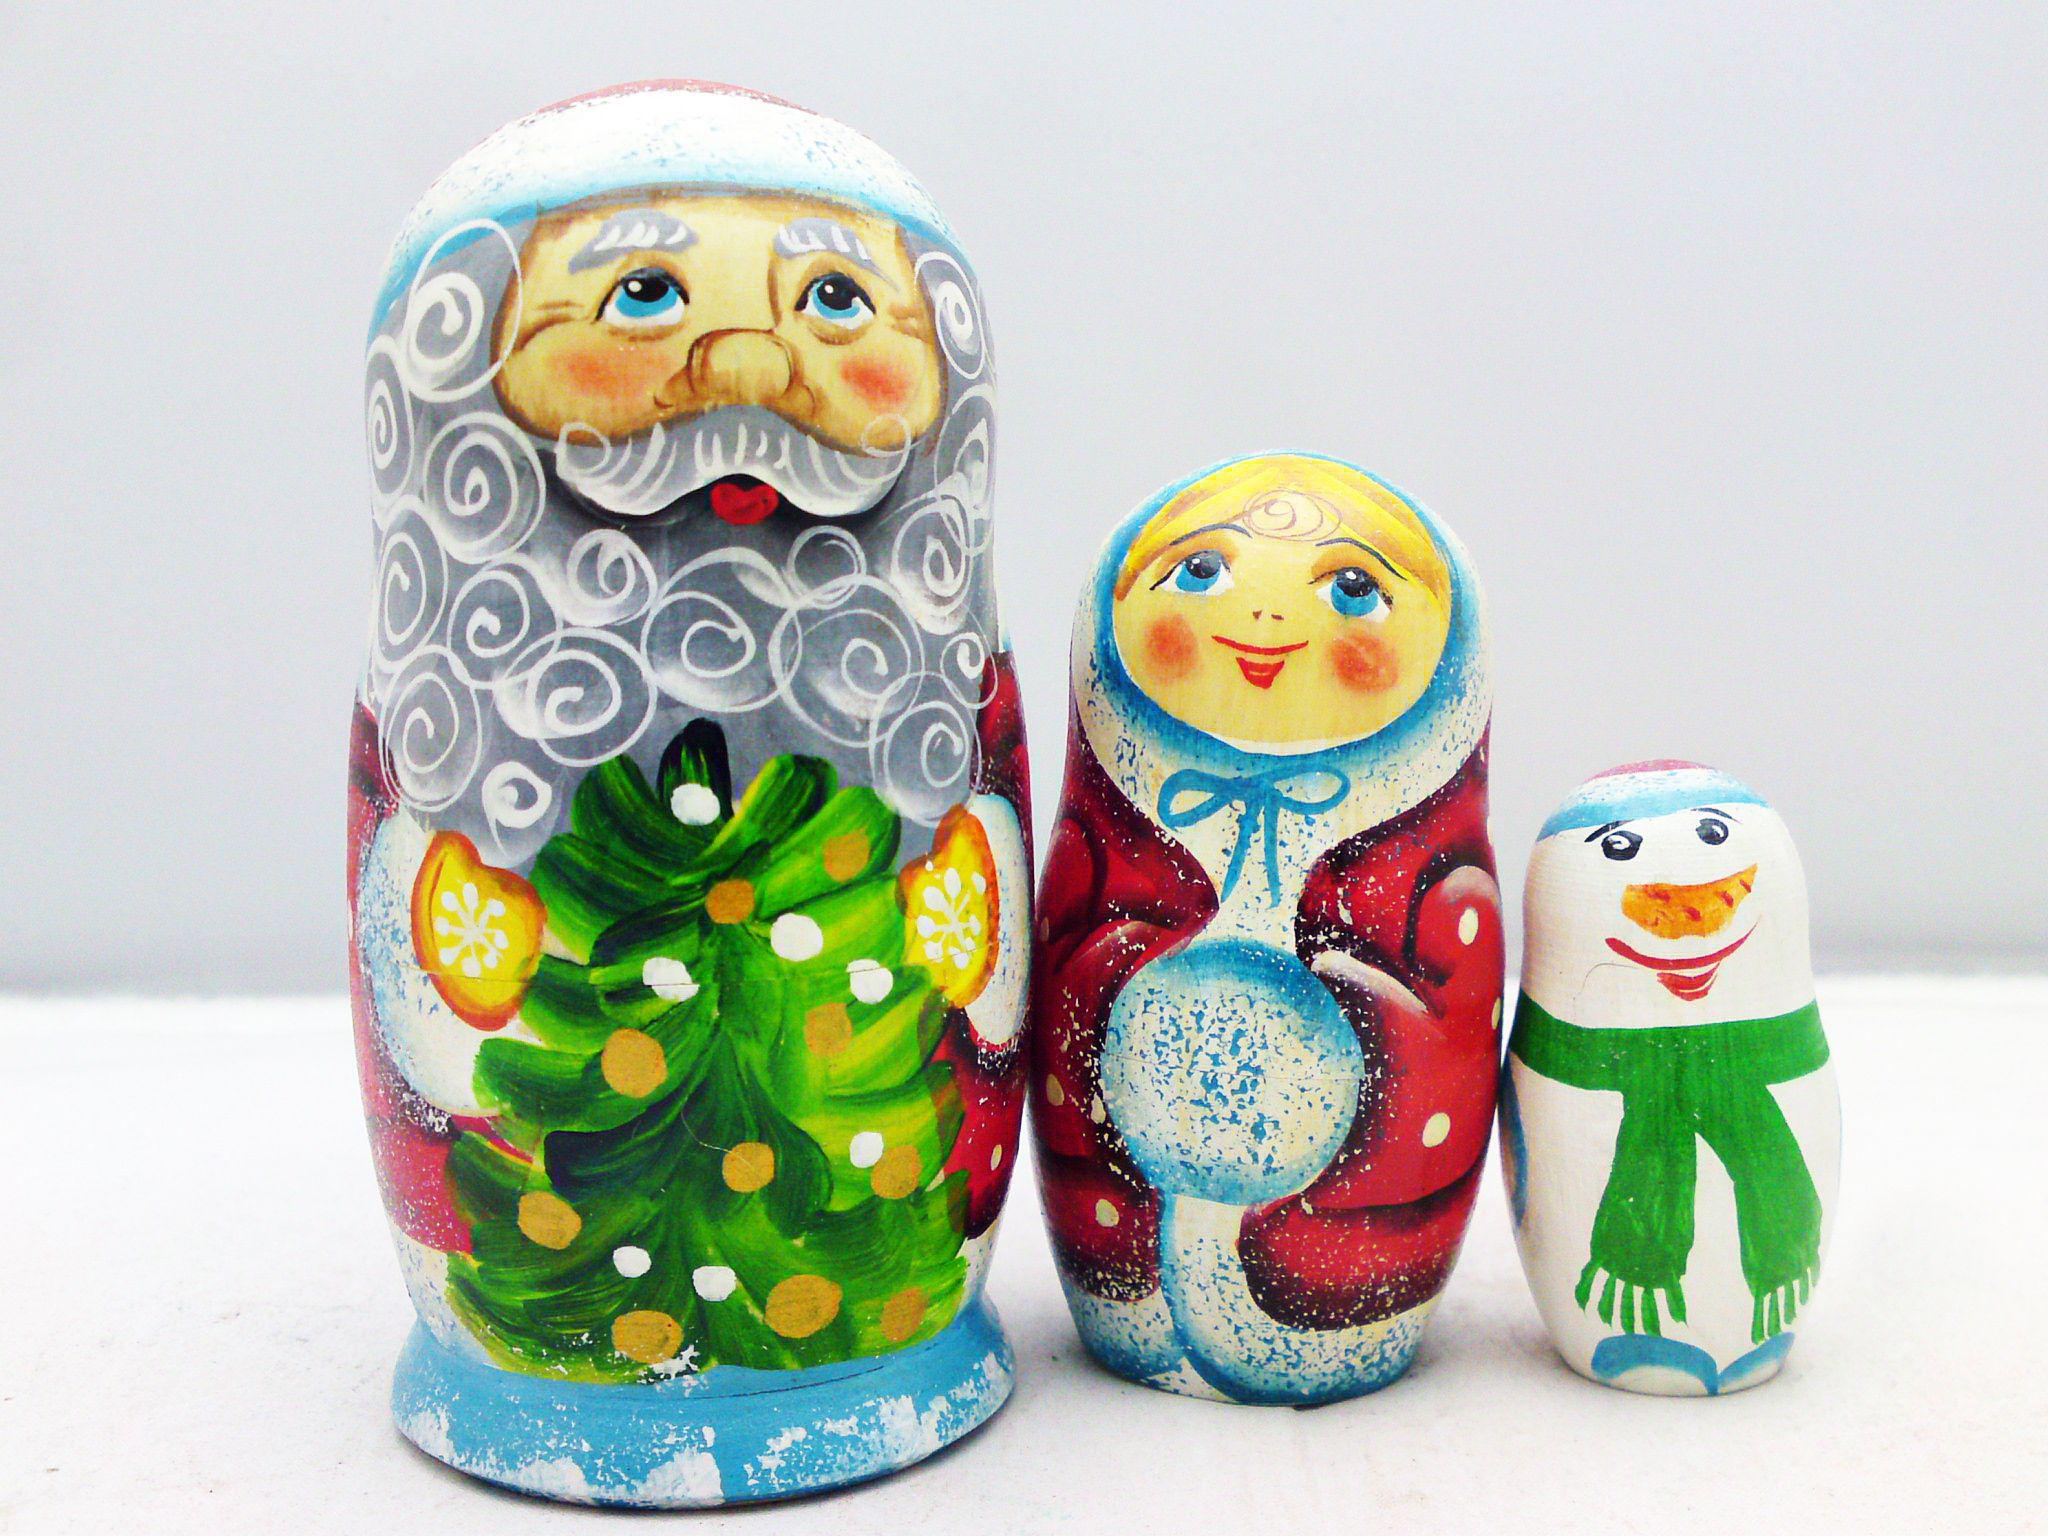 -MAtroesjka, Matroschka, MAtrjoschka, MAtriochka, MAtrioska, MAtrjosjka, Nesting Dolls Christmas - NAvidad Noël-Natal-Kerstmis-Weihnachten